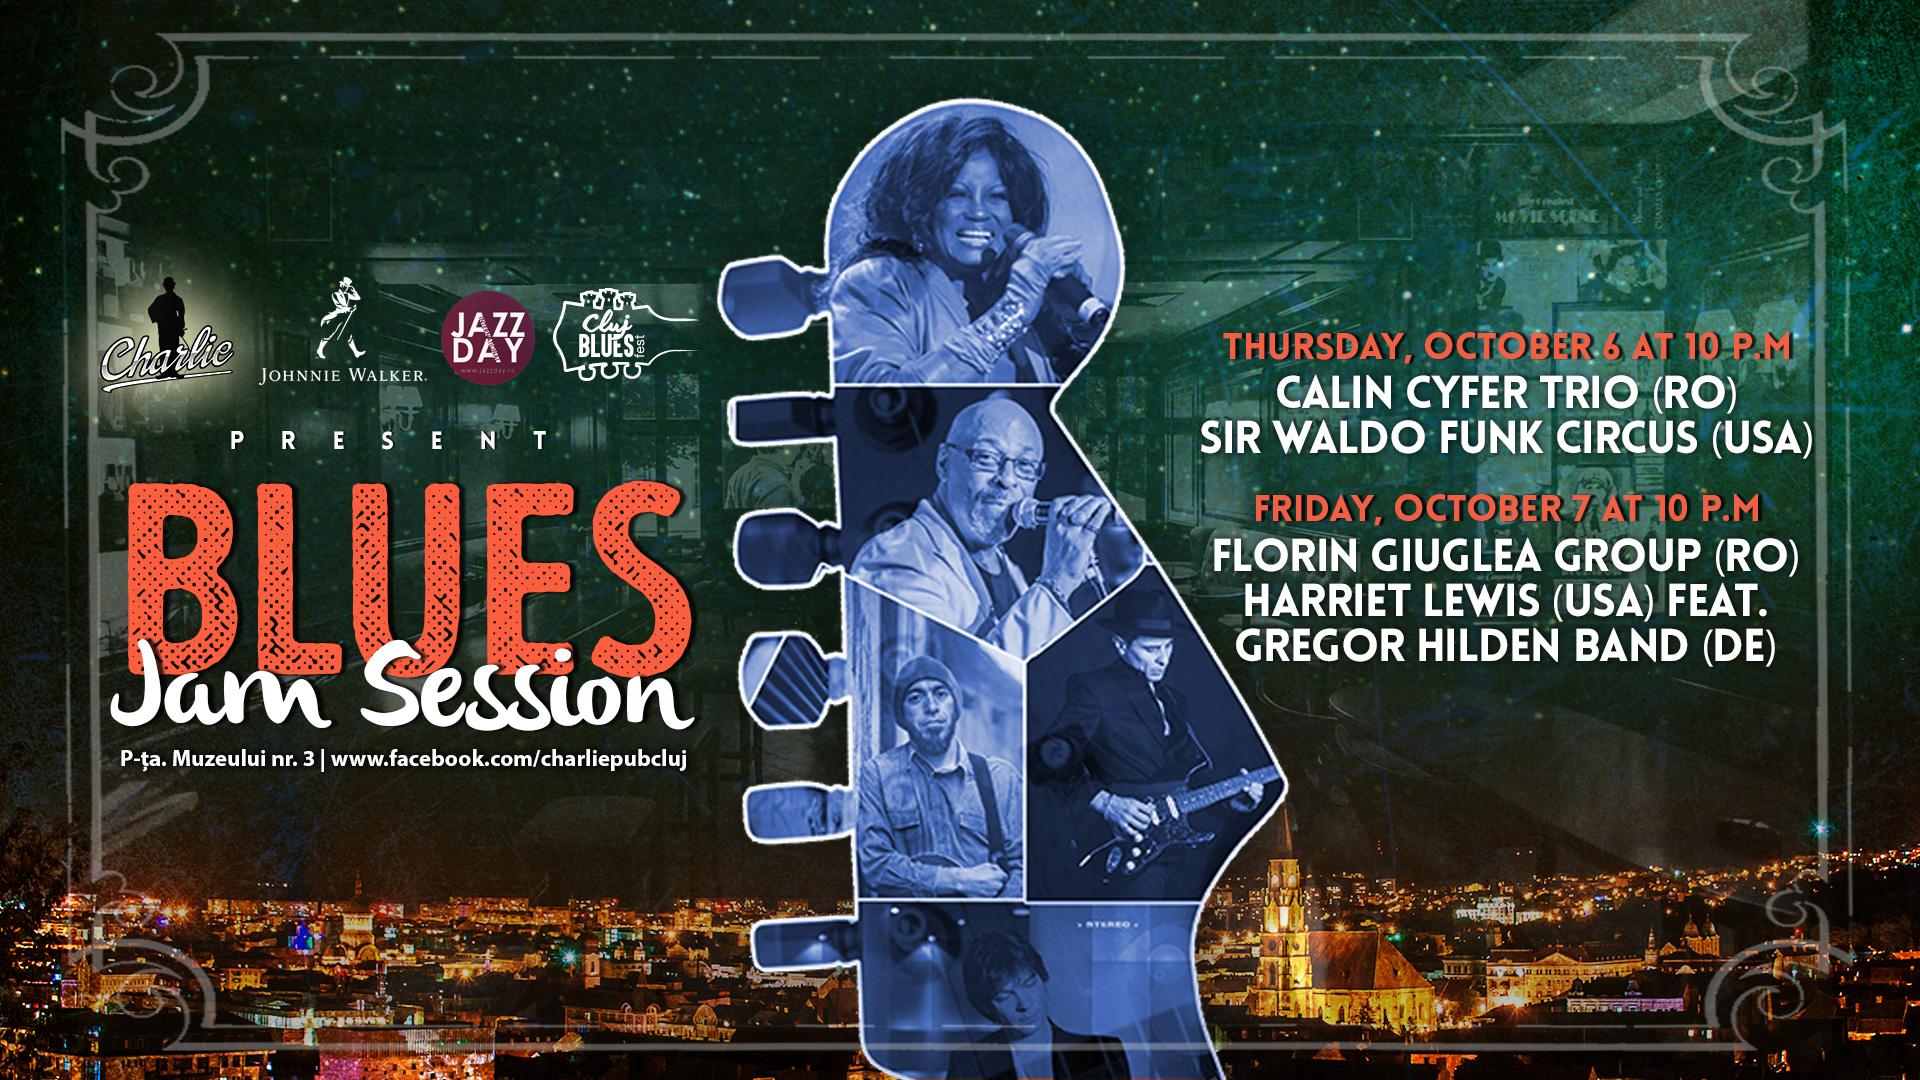 Blues Jam Session @ Charlie